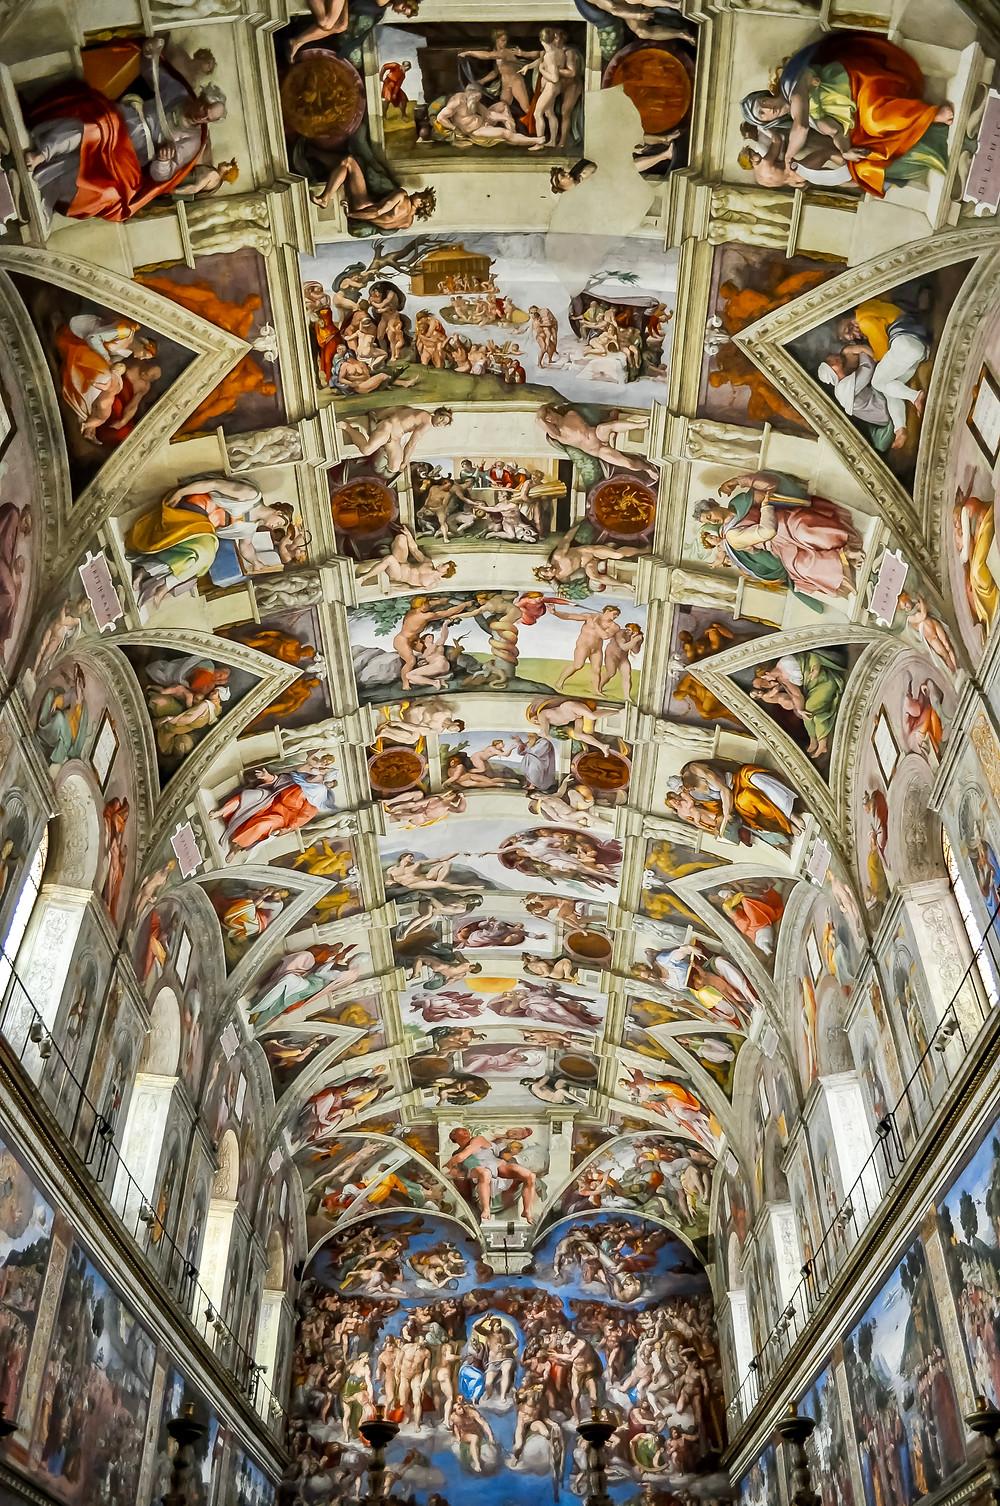 Michelangelo's Sistine Chapel frescos